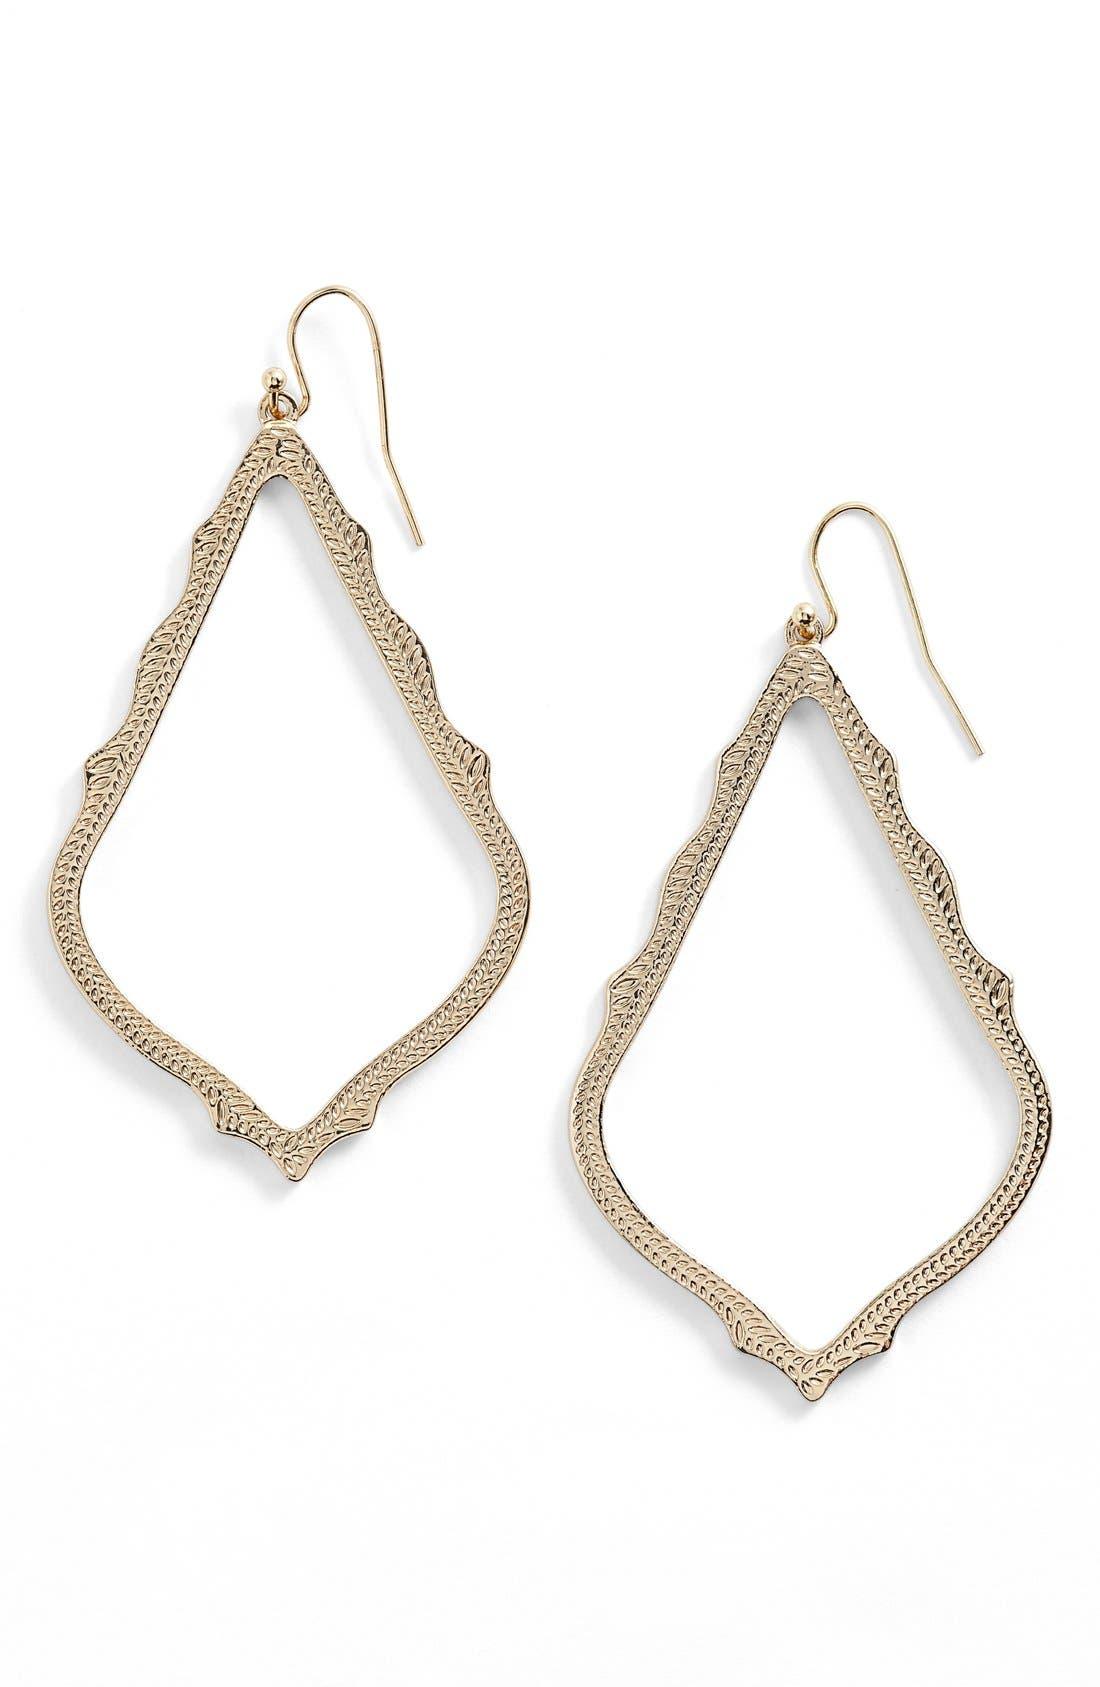 Main Image - Kendra Scott 'Sophee' Textured Drop Earrings